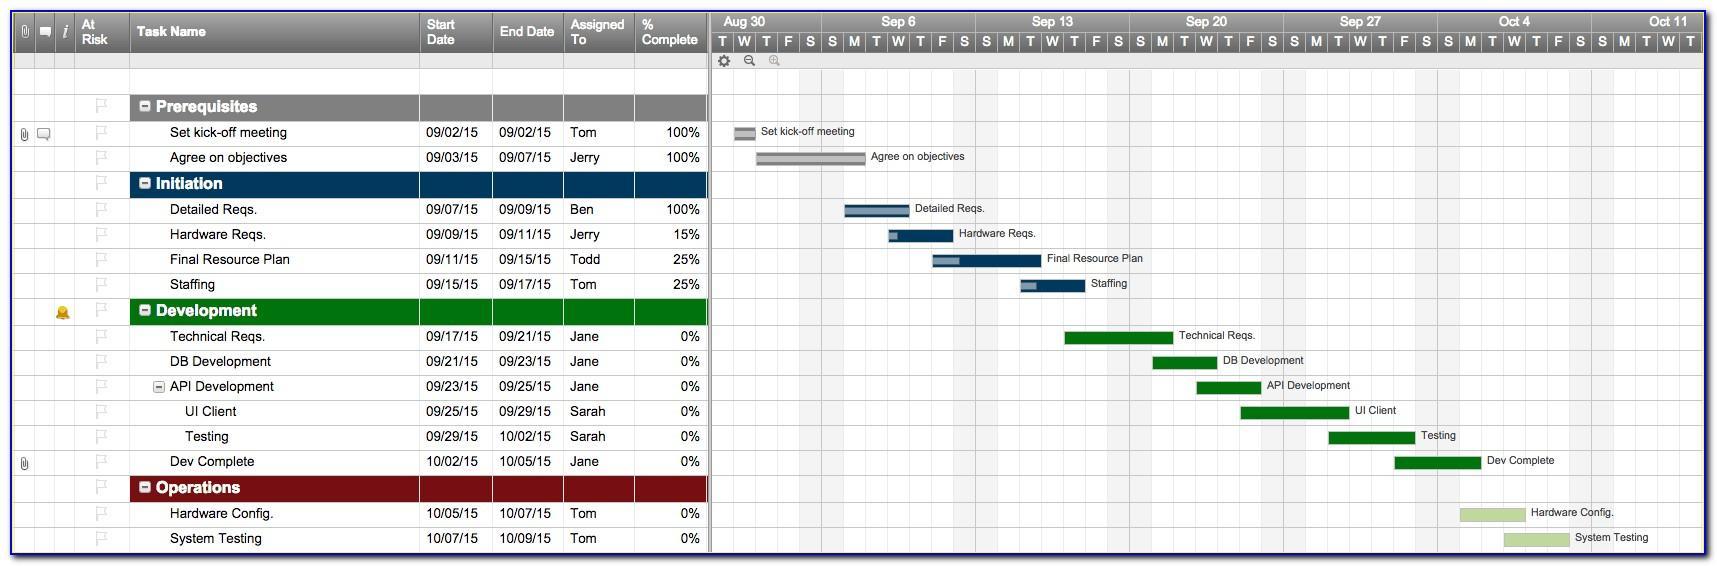 Planning Calendar Template Excel